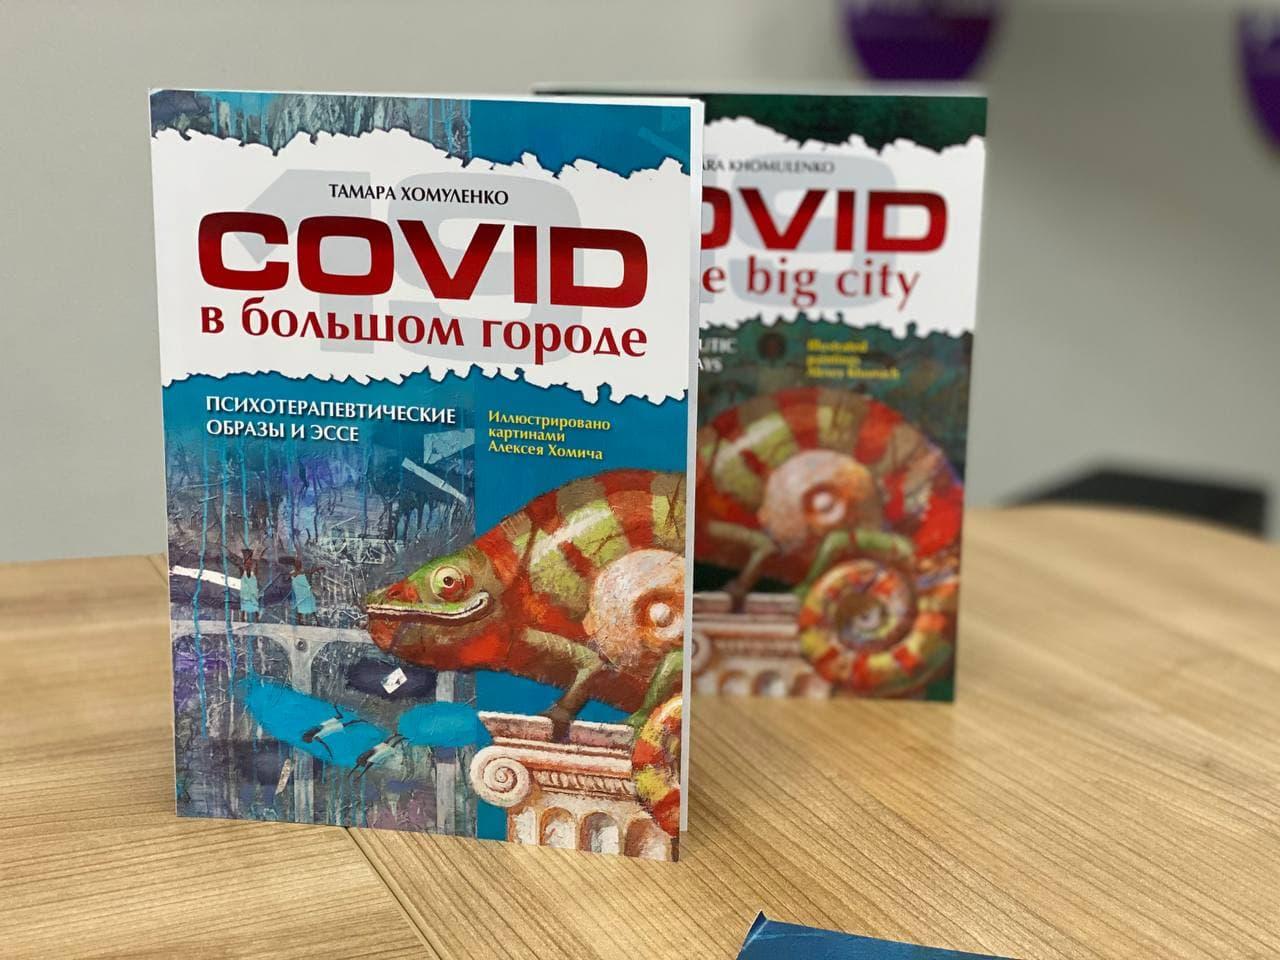 Харьковчанка презентовала книгу о влиянии COVID-19 на психику человека (фото)